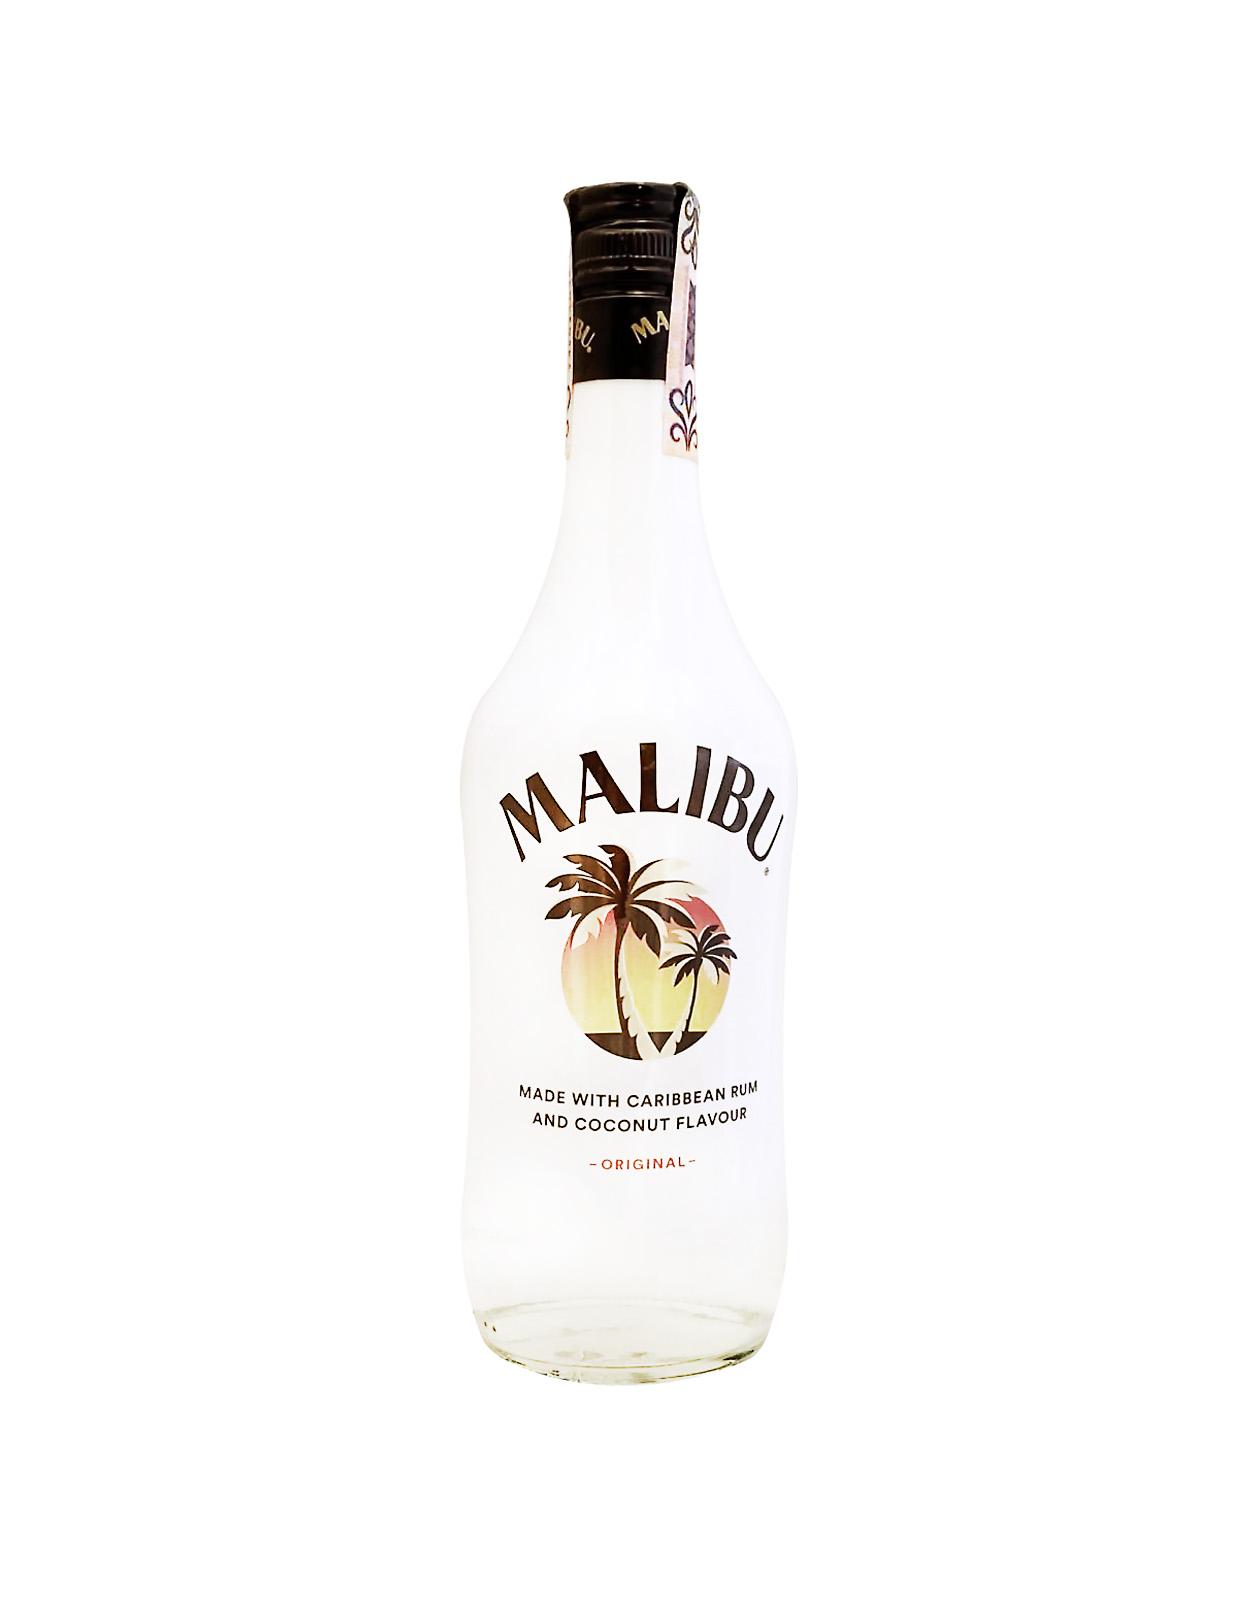 Malibu 21%, Bottleshop Sunny wines slnecnice mesto, petrzalka, likér, rozvoz alkoholu, eshop